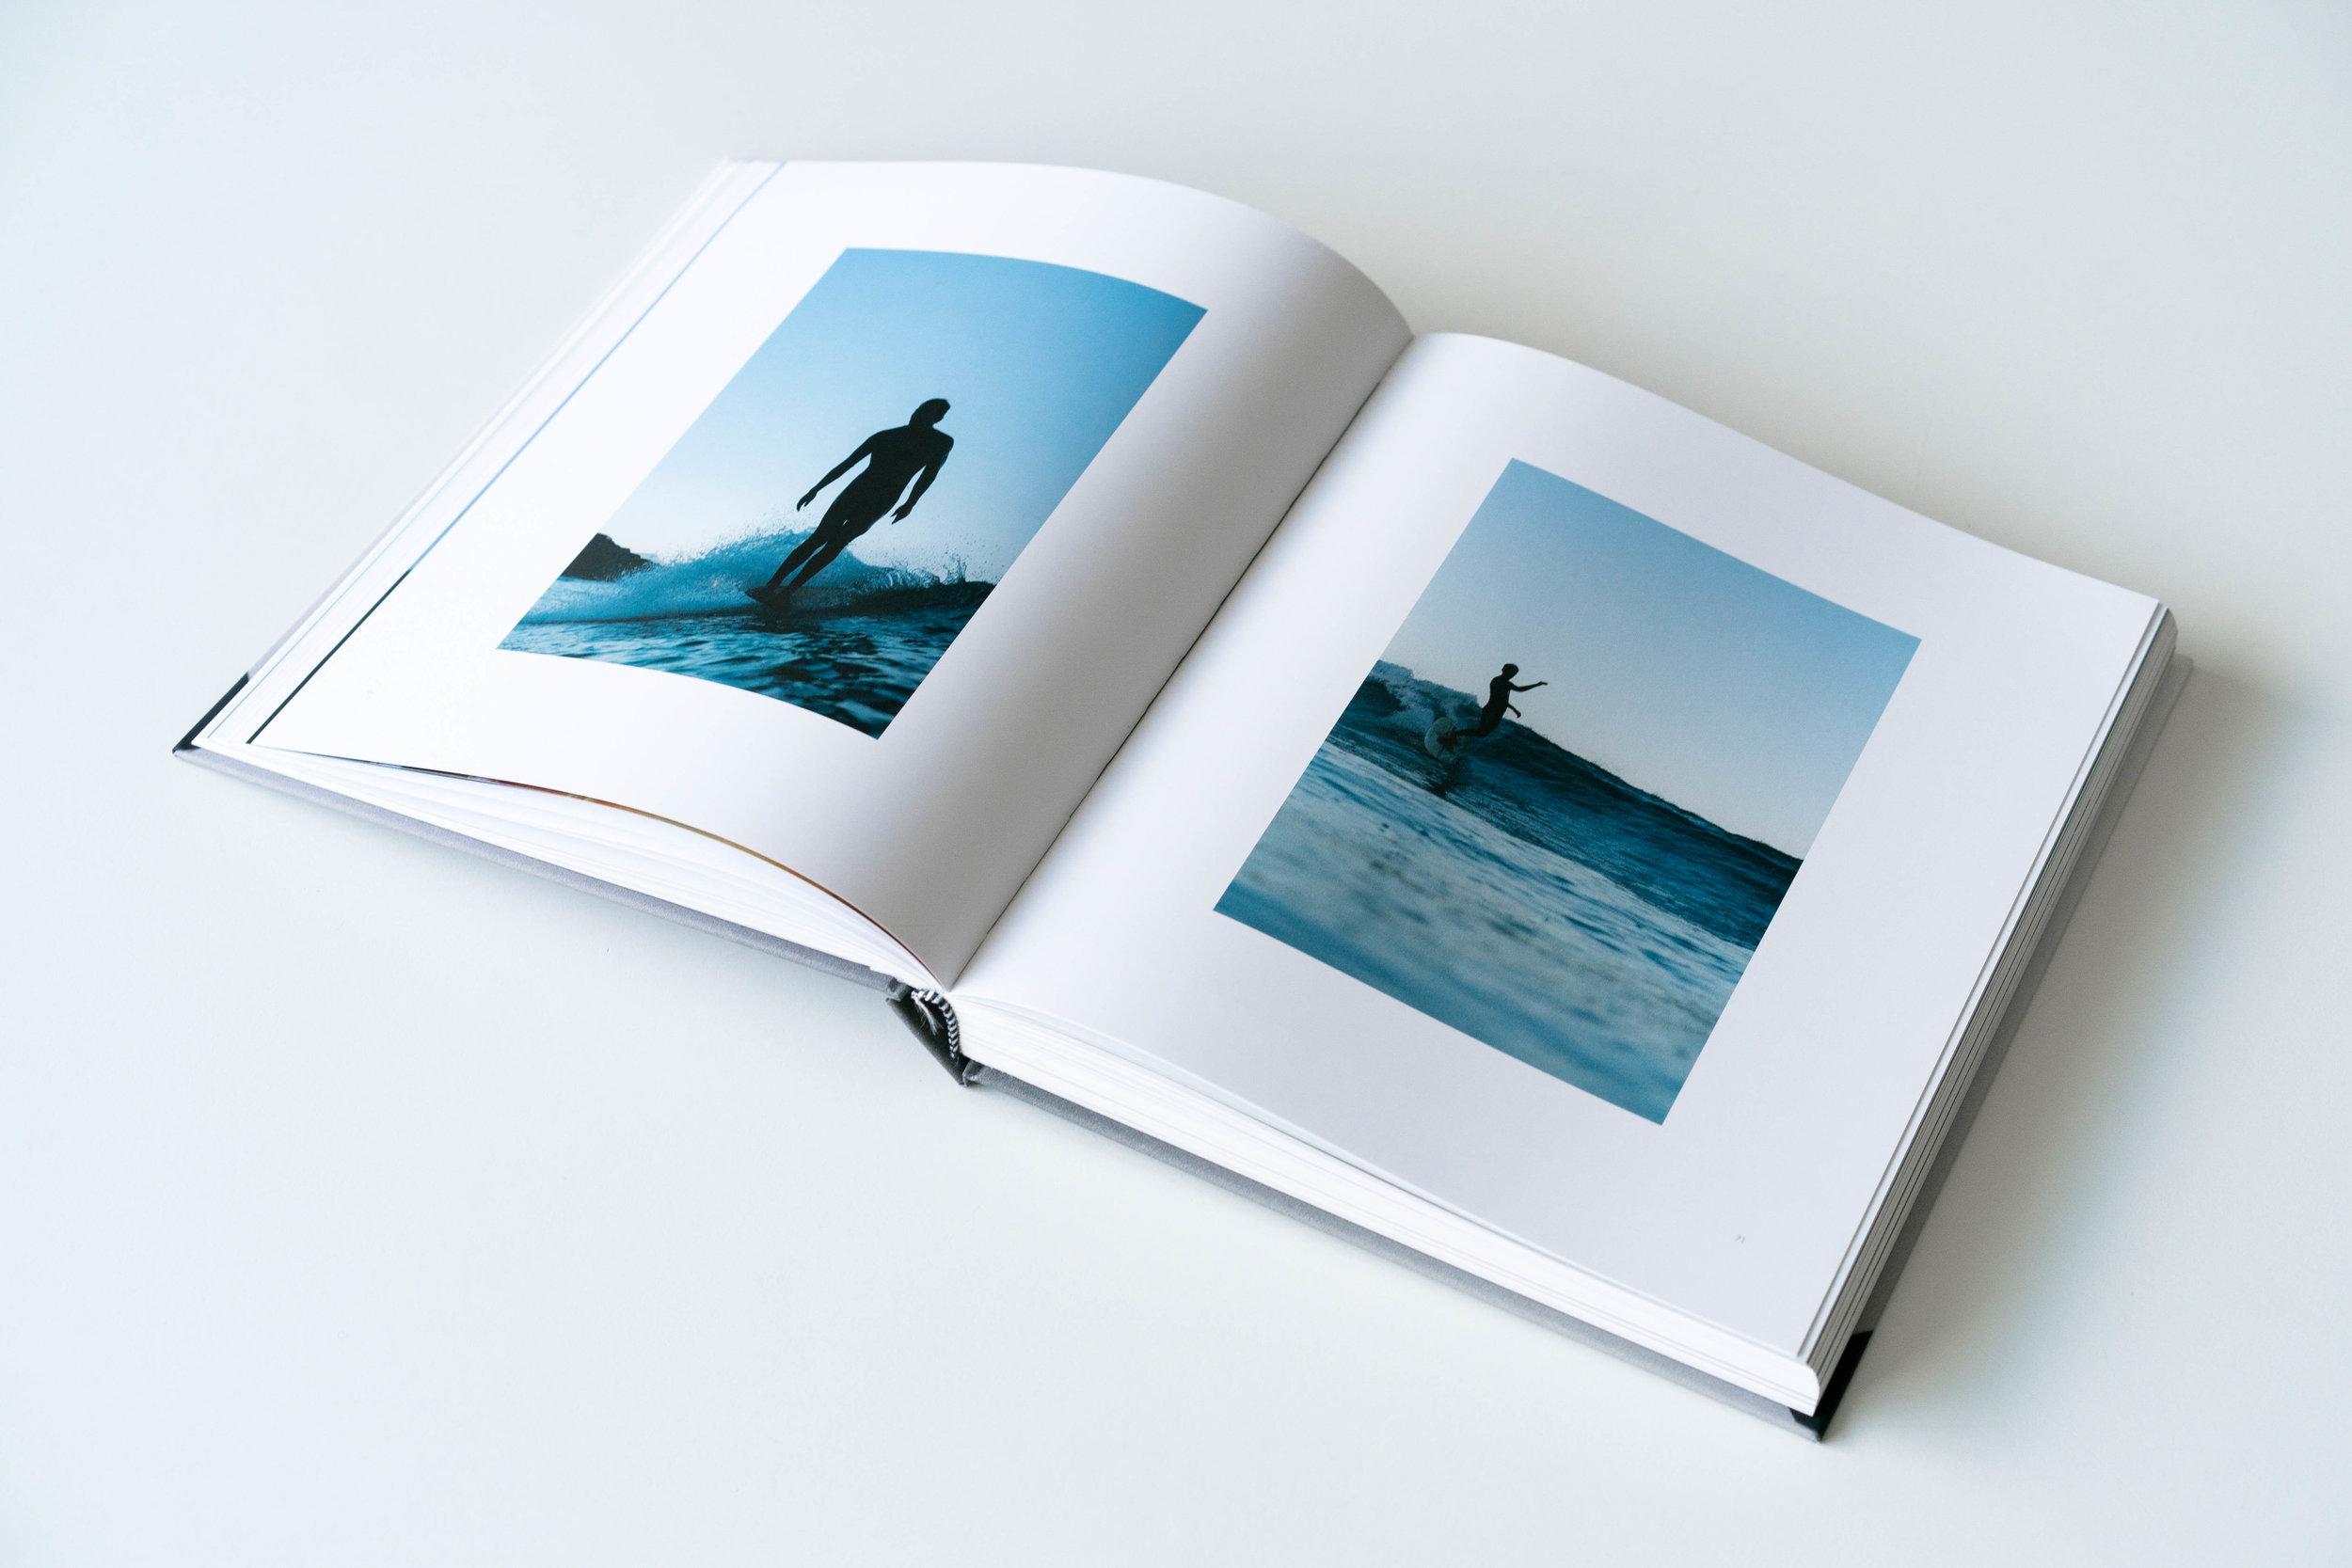 Packshot_Book-Impressions_TLodin_TL_02904.jpg